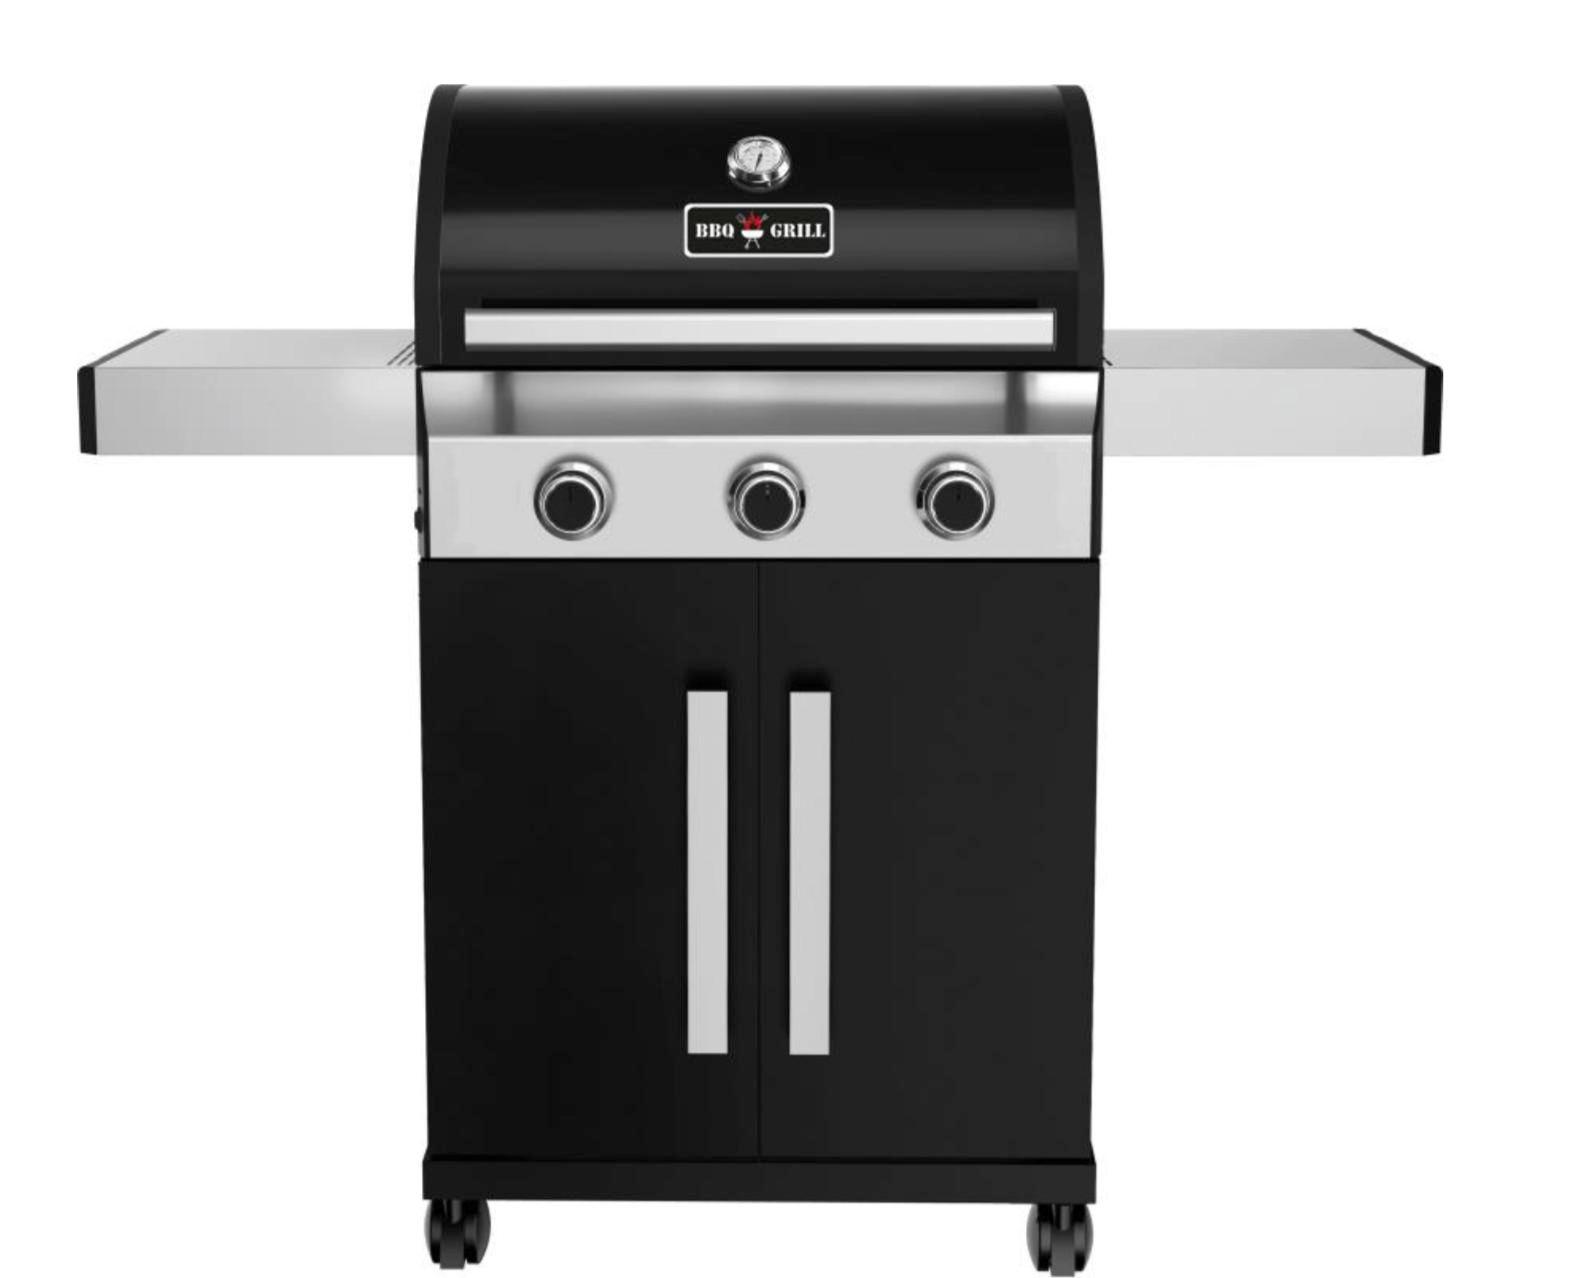 Enders Gasgrill San Diego 3 Bewertung : Edelstahl gasgrill grill grillwagen barbecue bbq mit